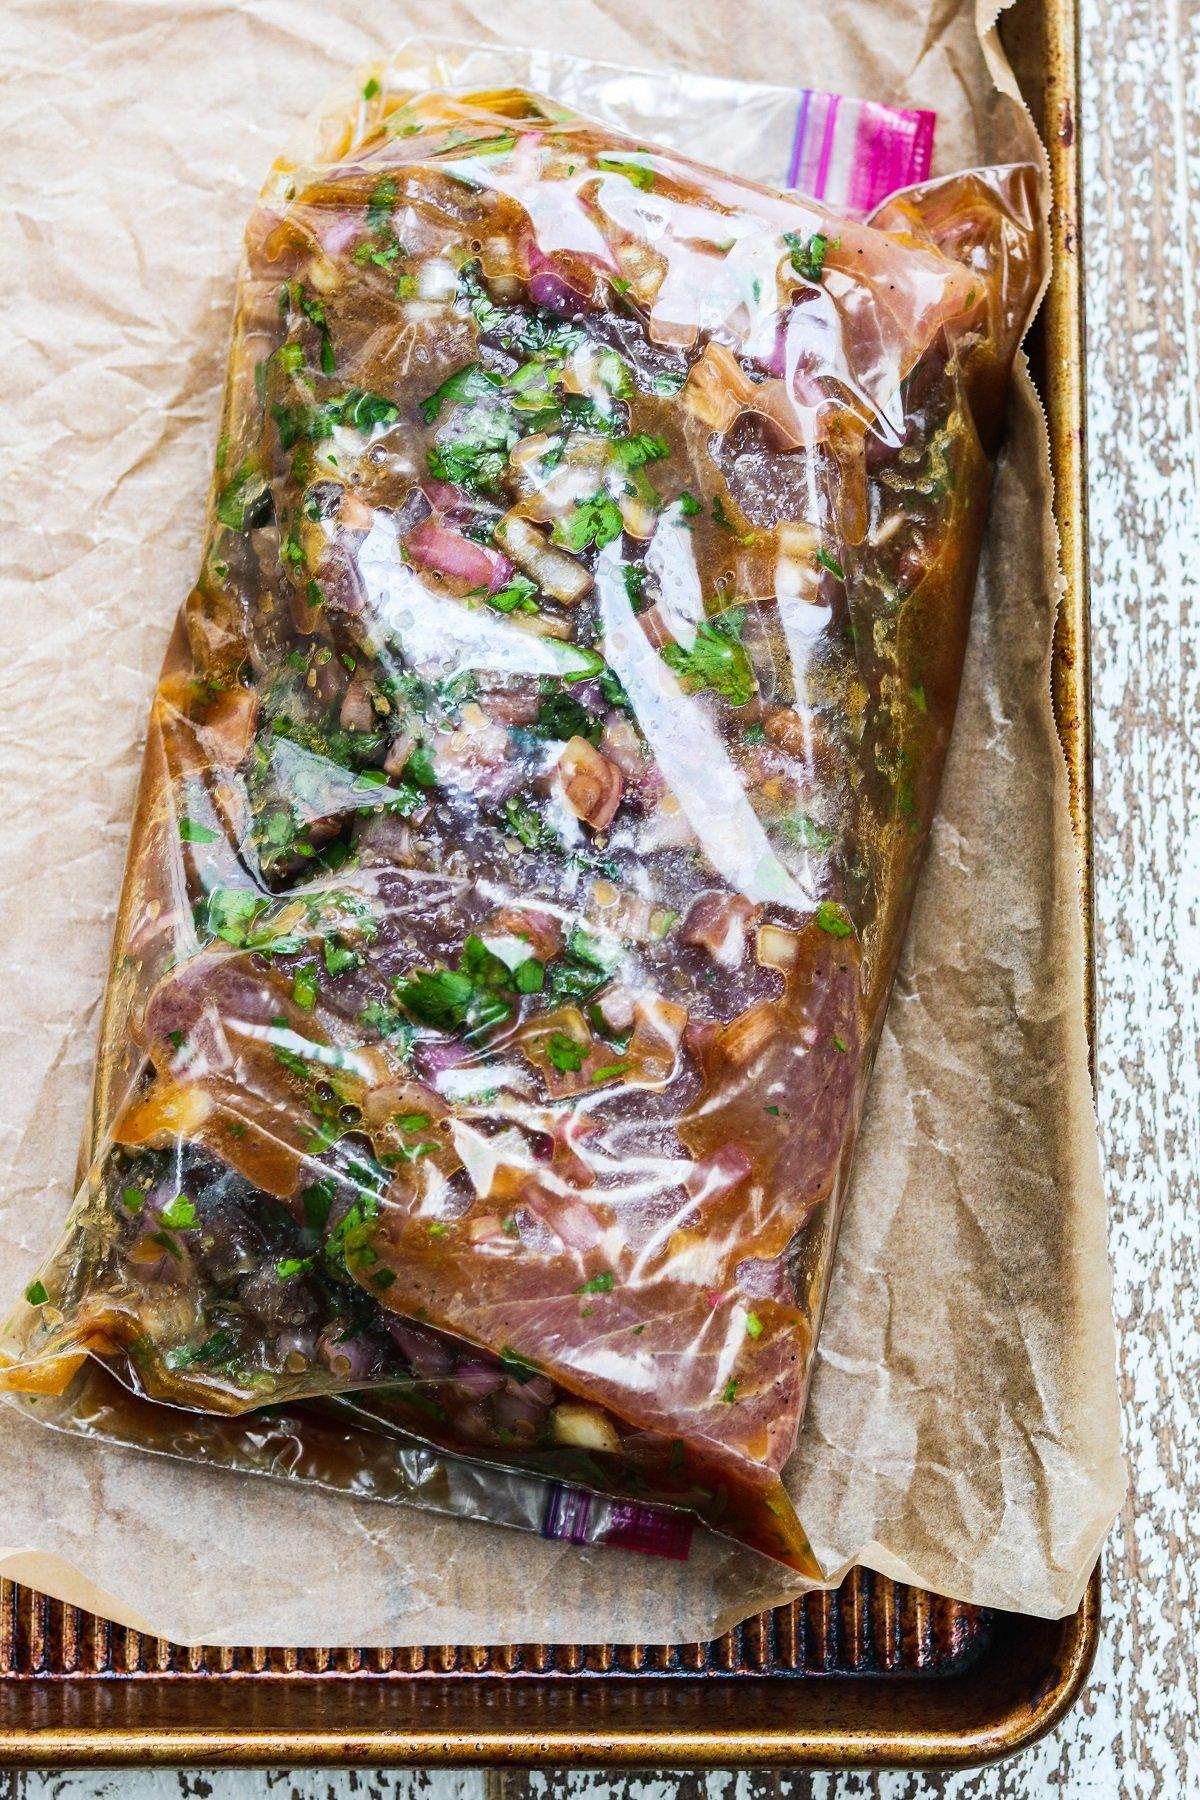 Tuna steaks marinating in resealable plastic bag.